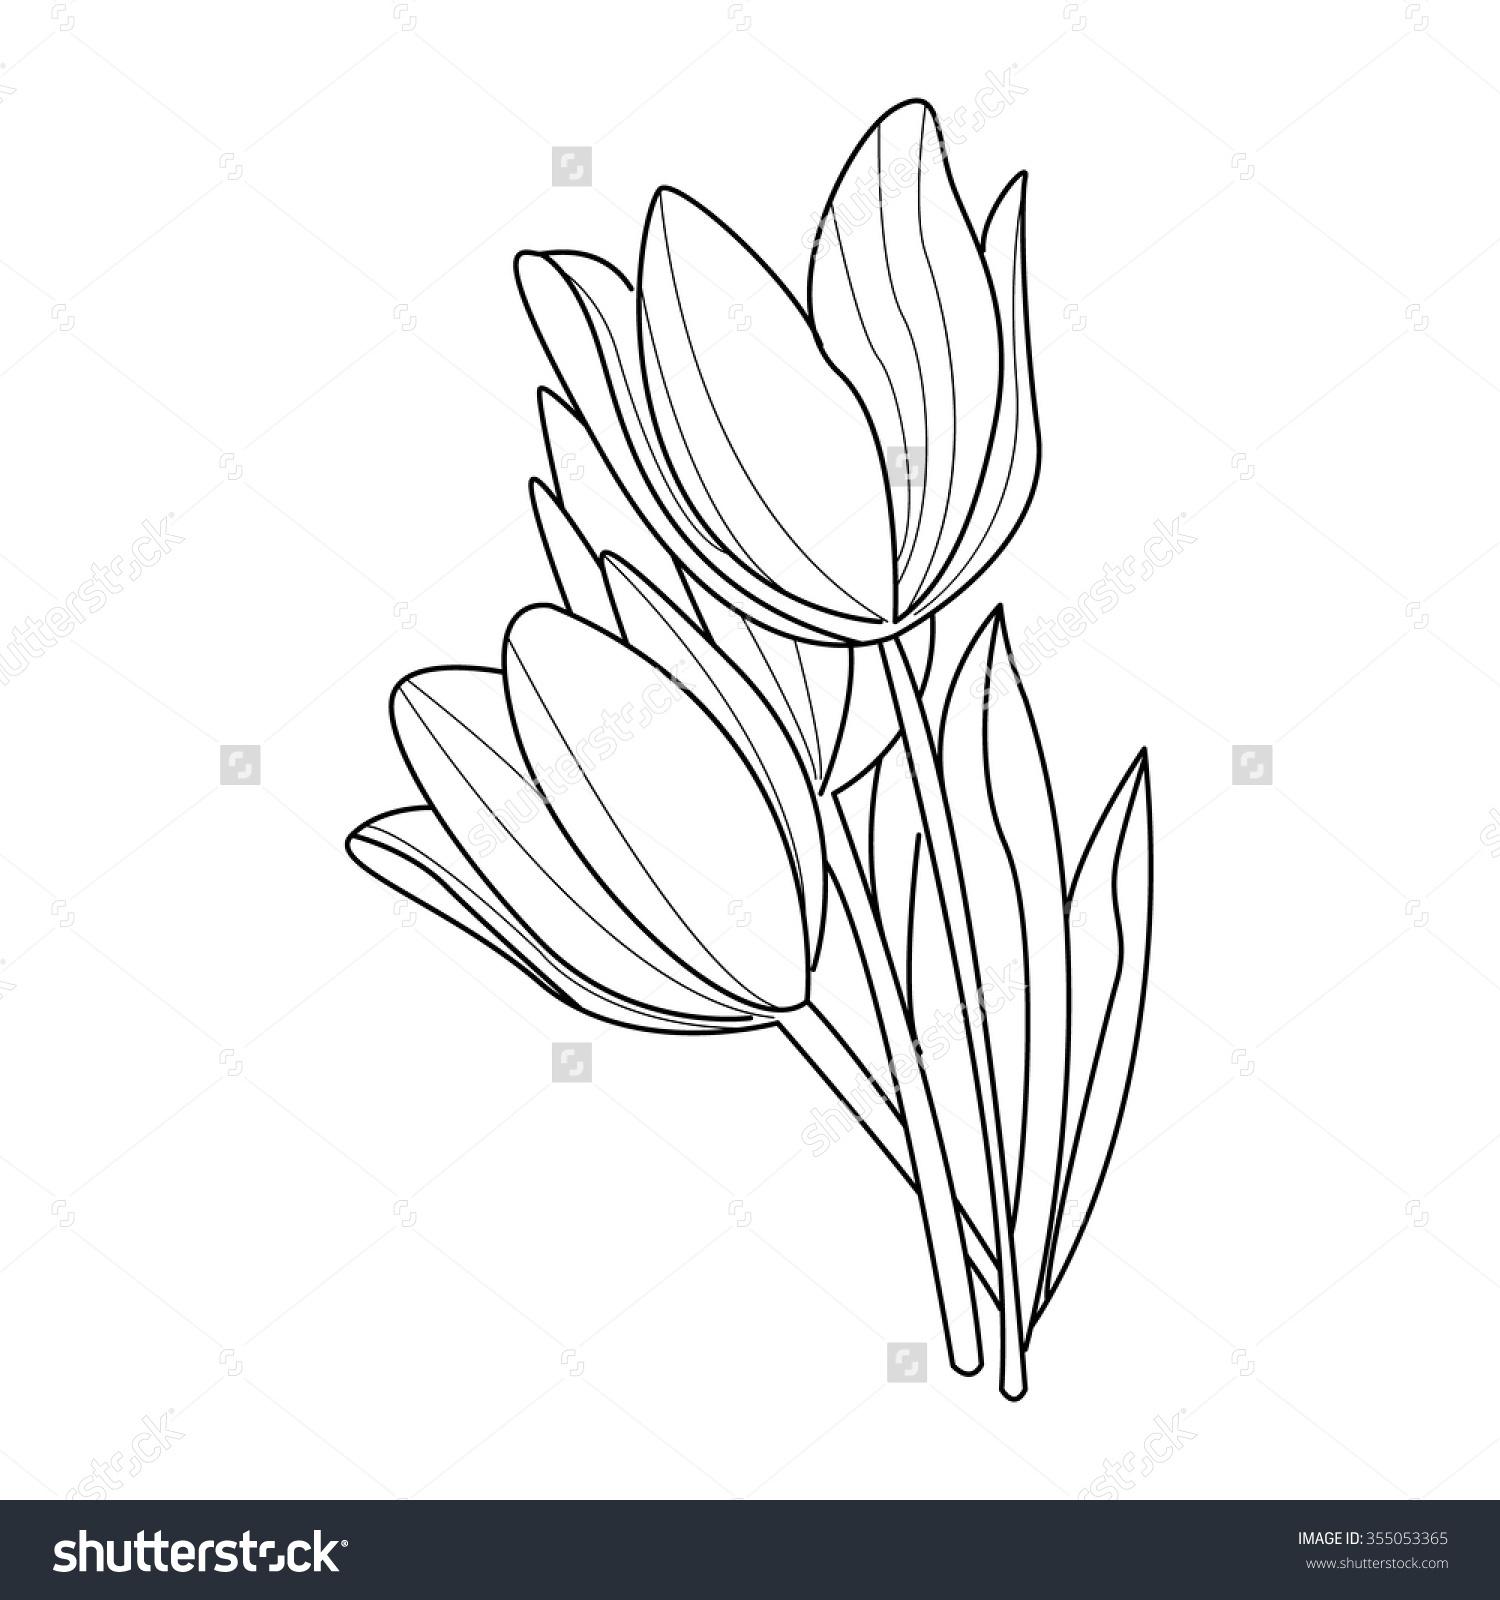 1500x1600 Tulip Flower Drawing